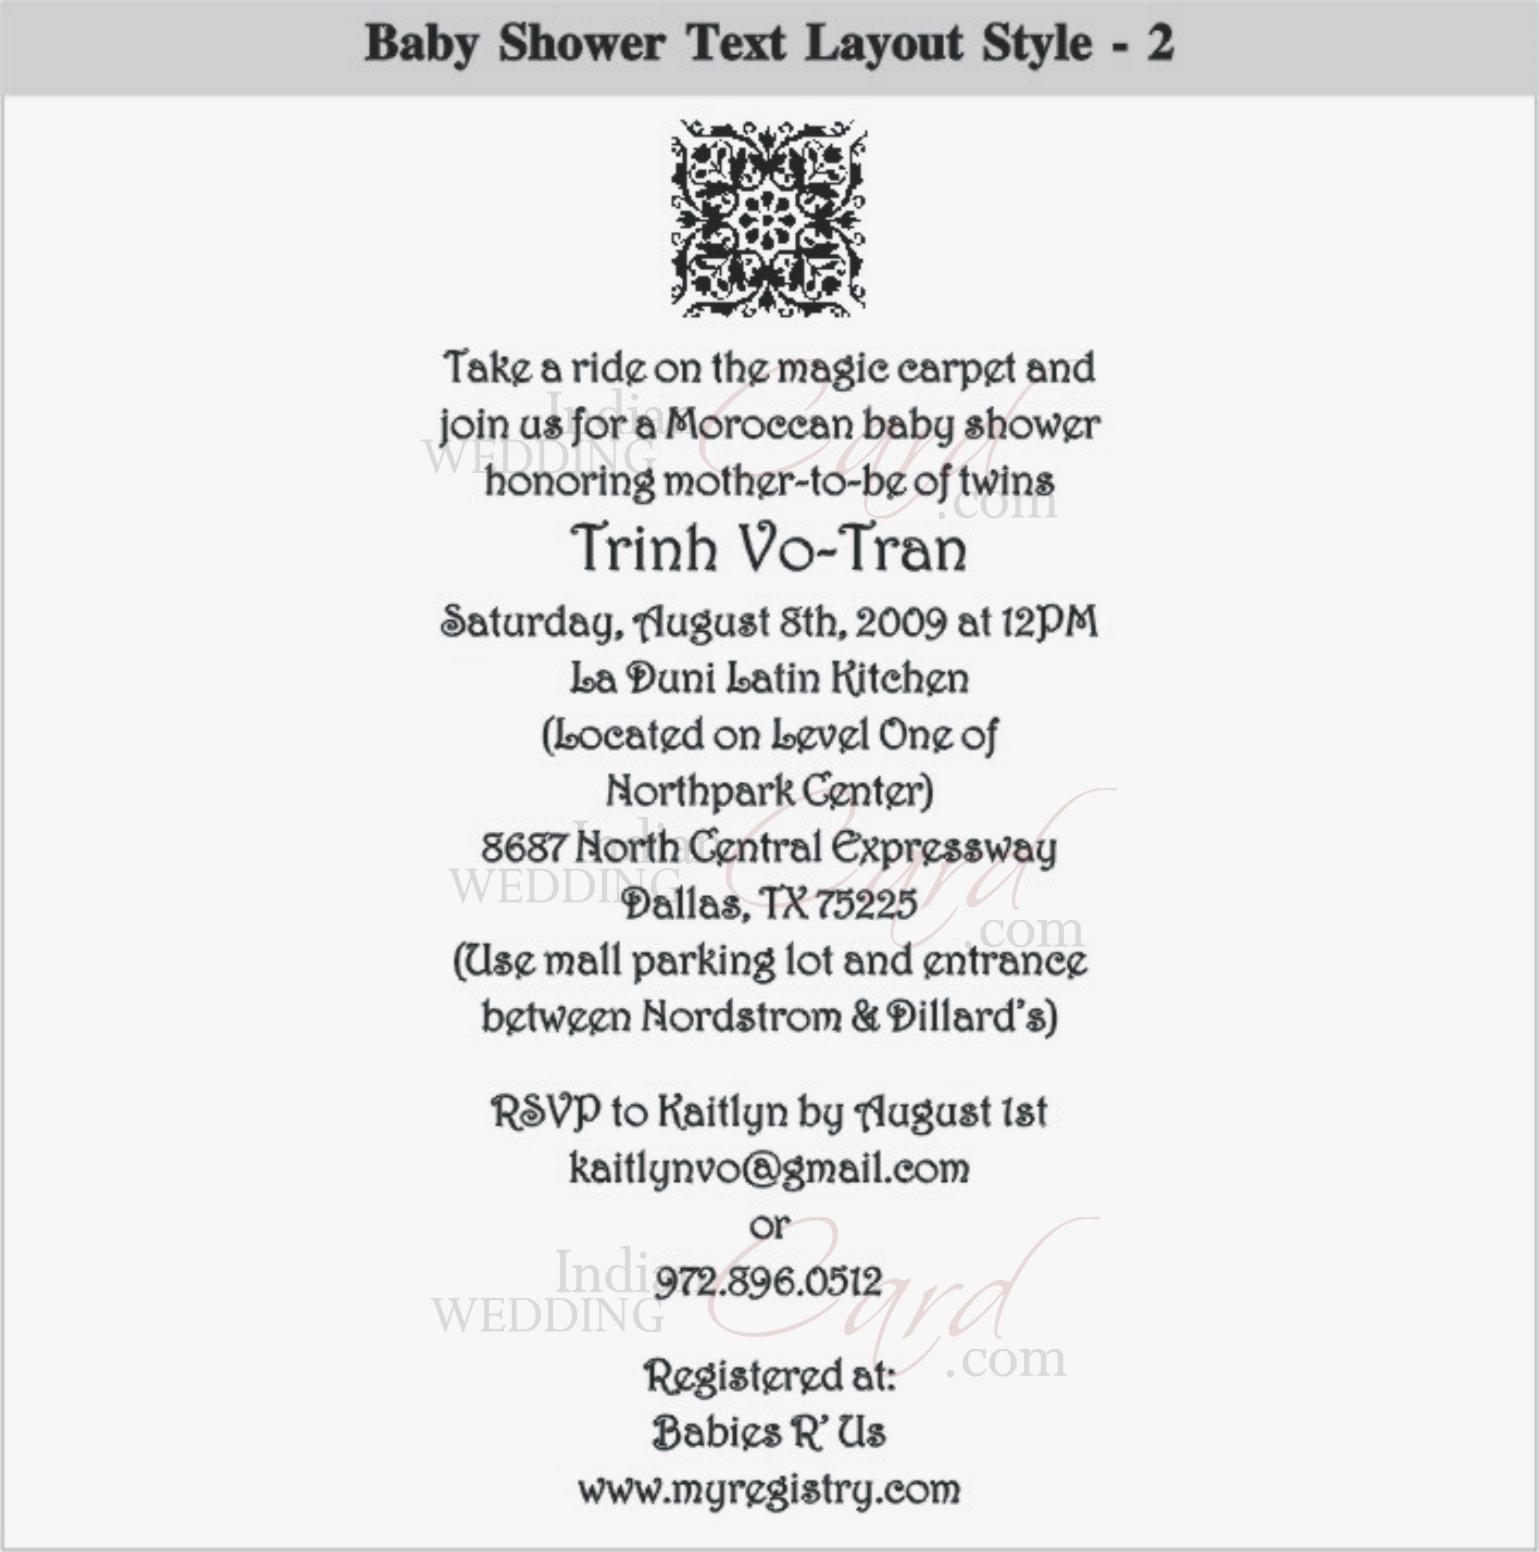 Scroll wedding invitations scroll invitations wedding scrolls bat baby shower layout 2 filmwisefo Images